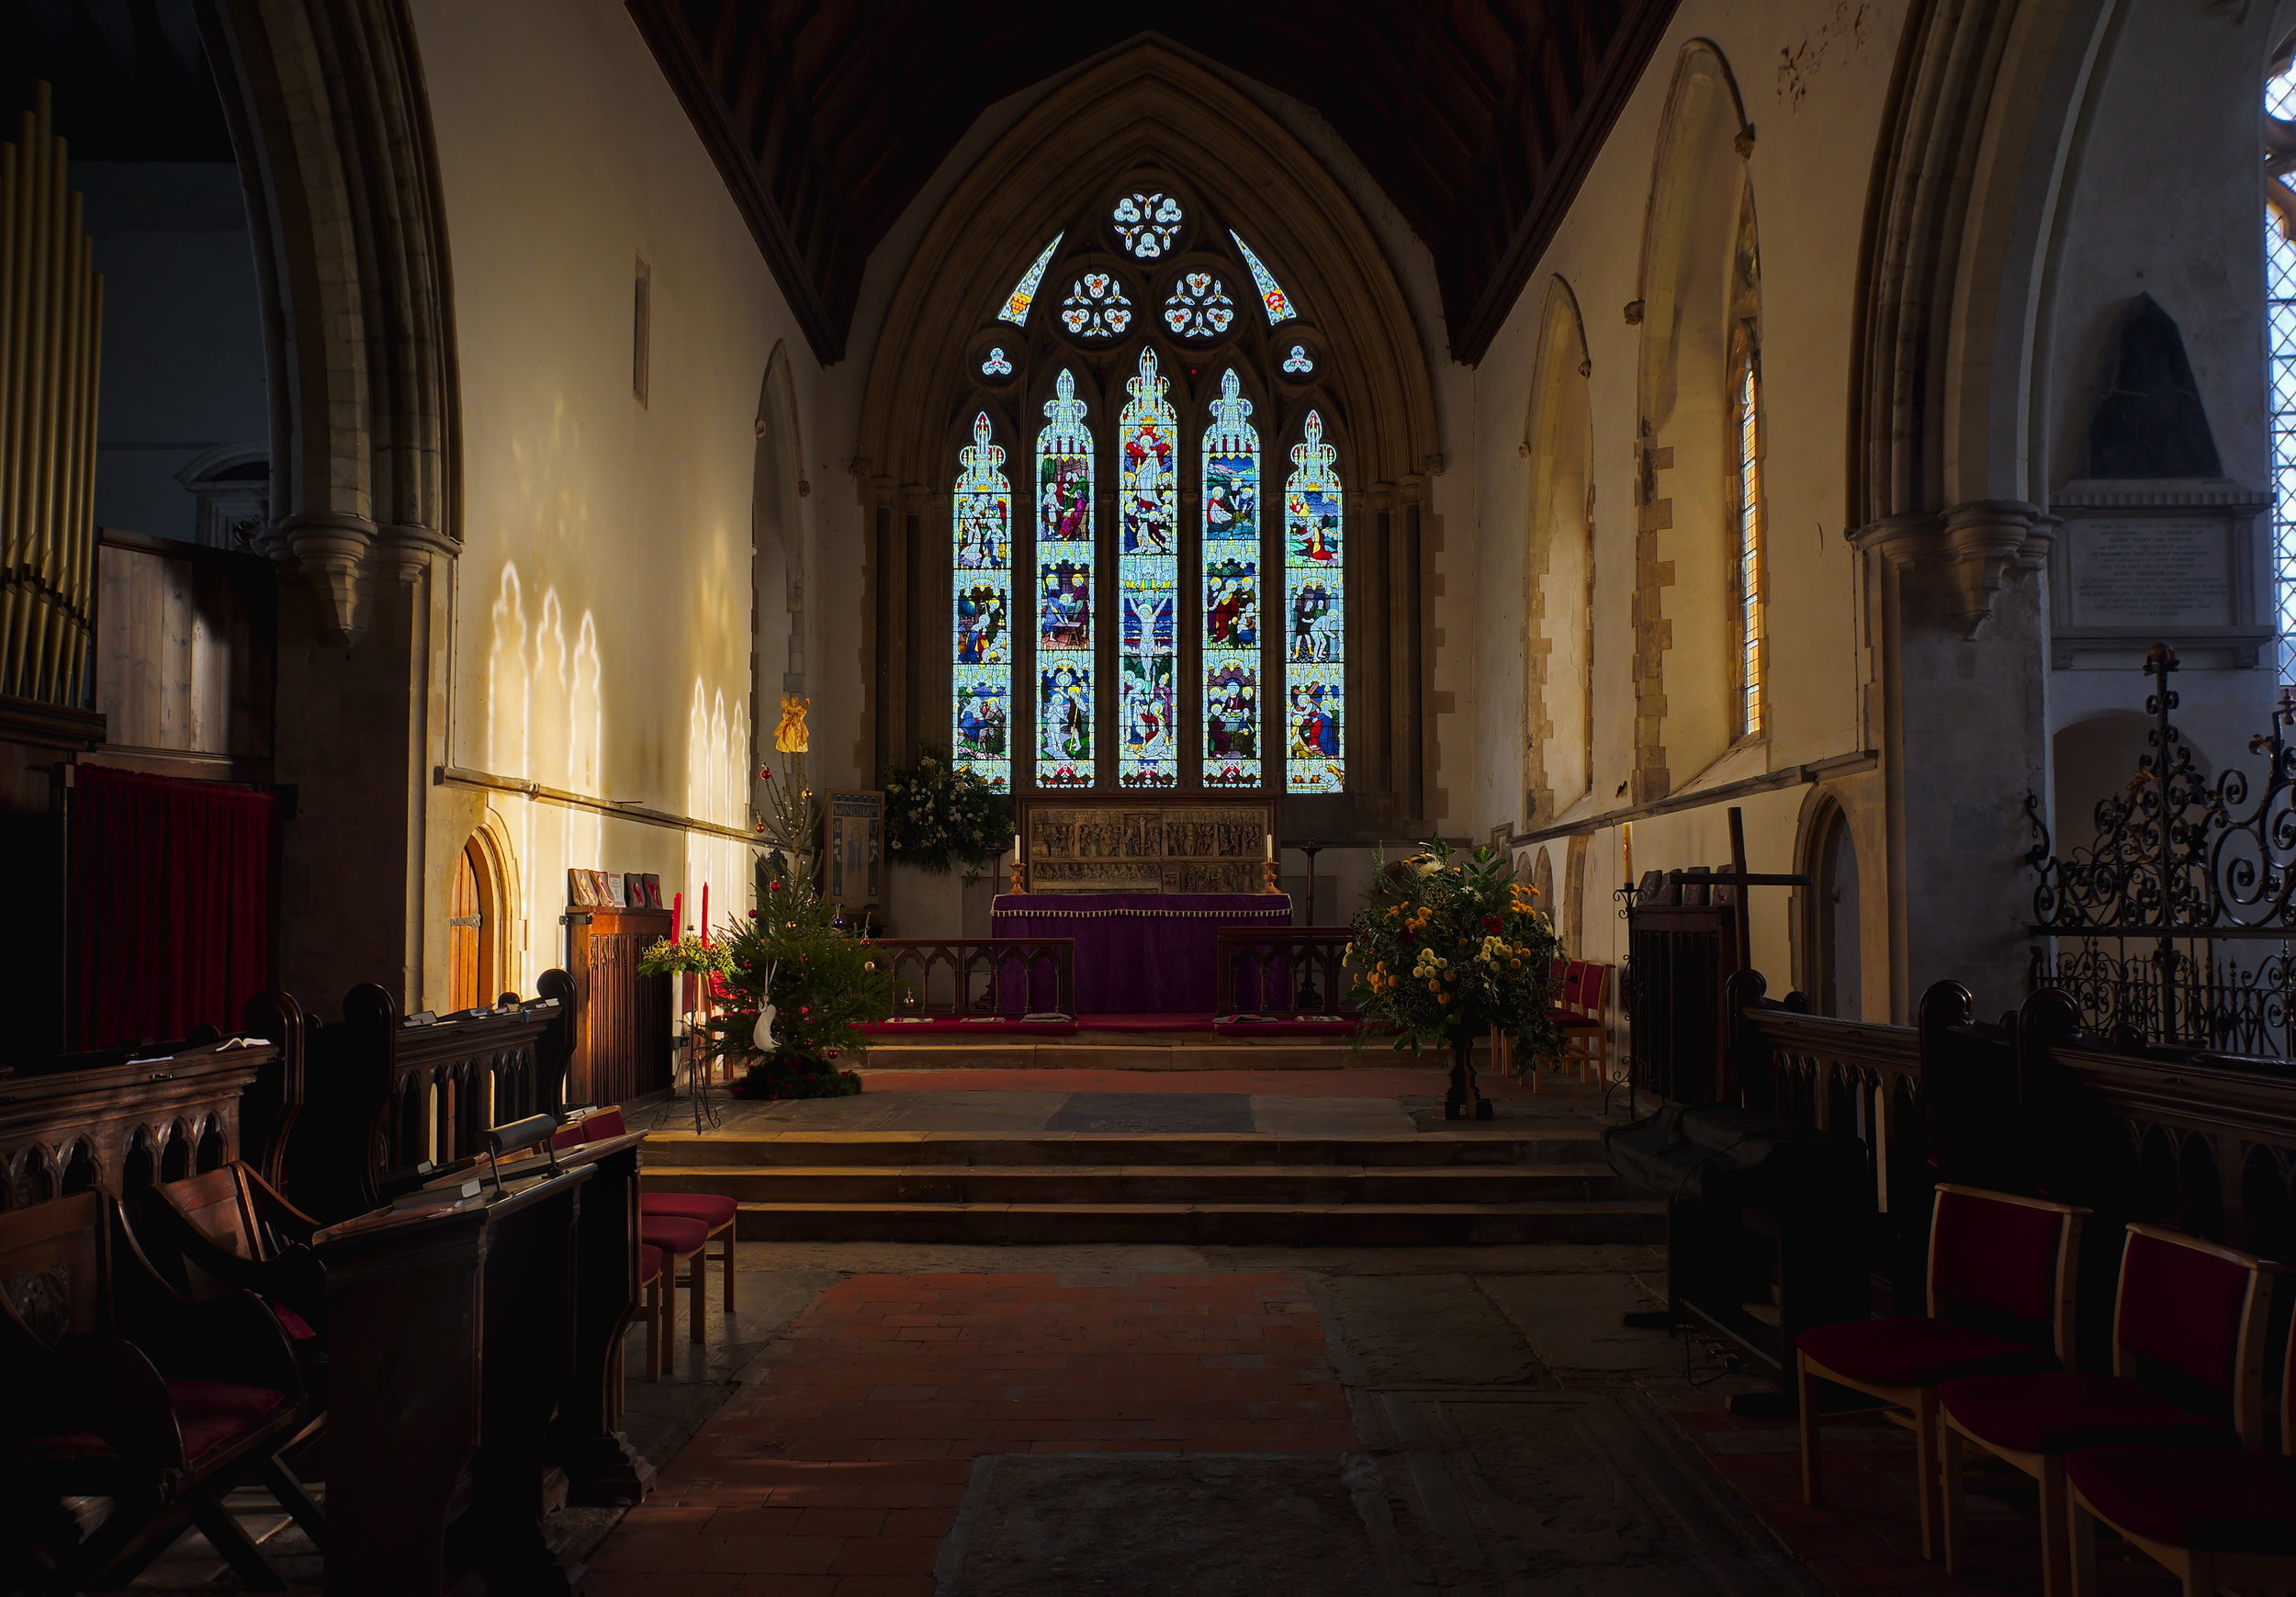 Interior, chancel